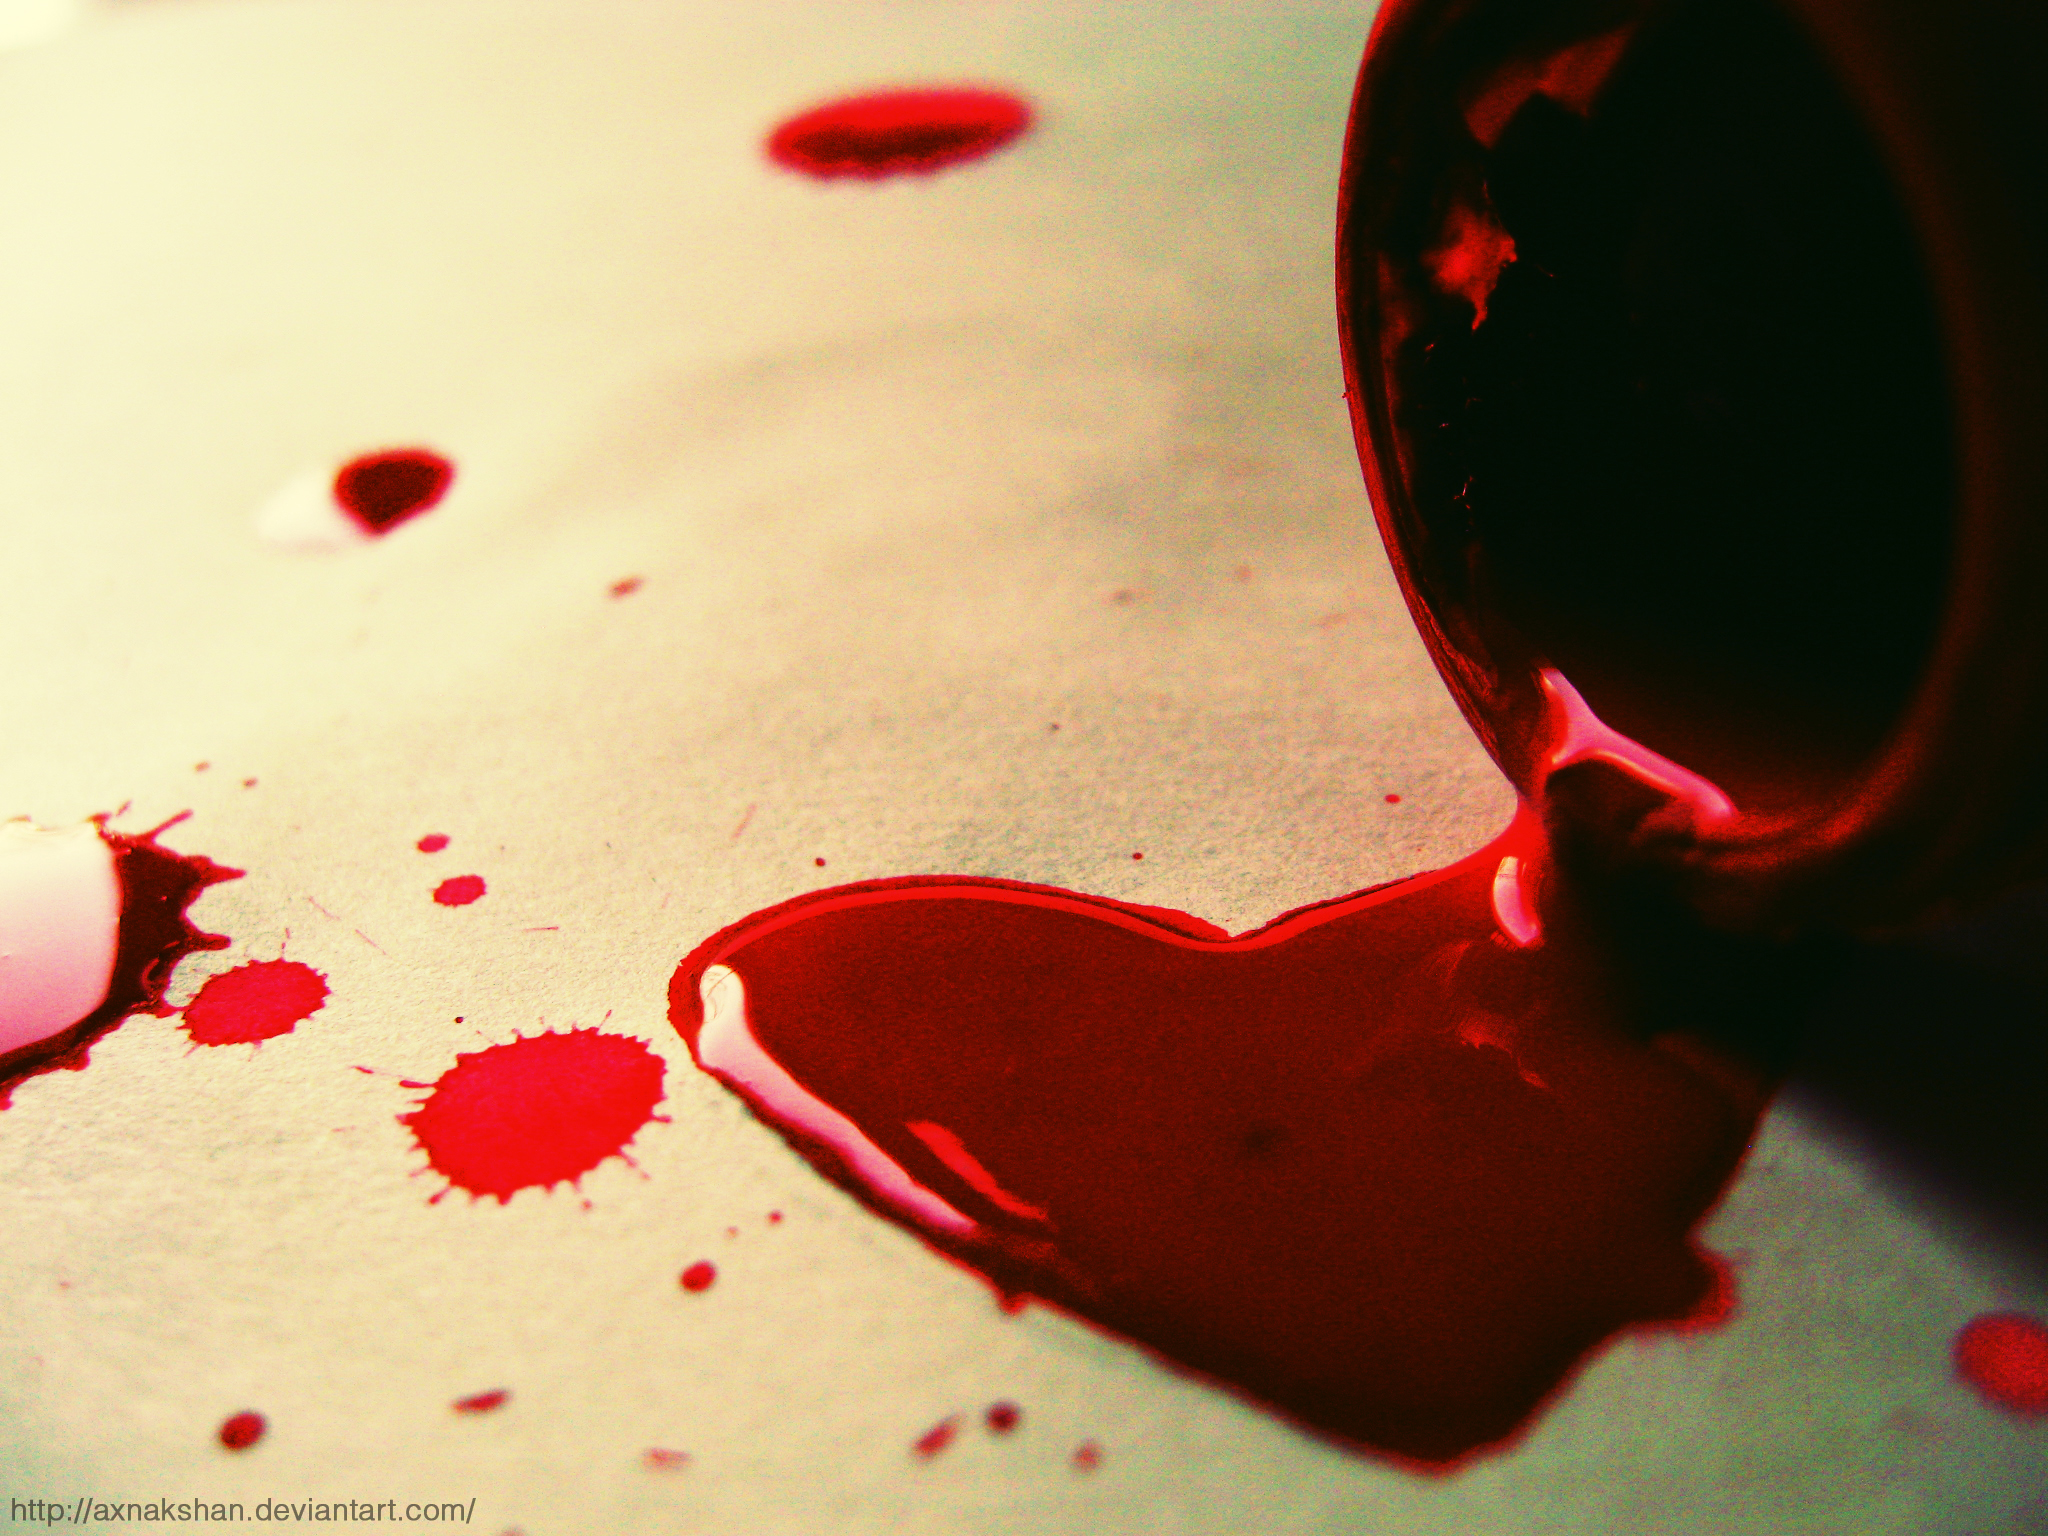 Bleeding Wrist Images - Reverse Search